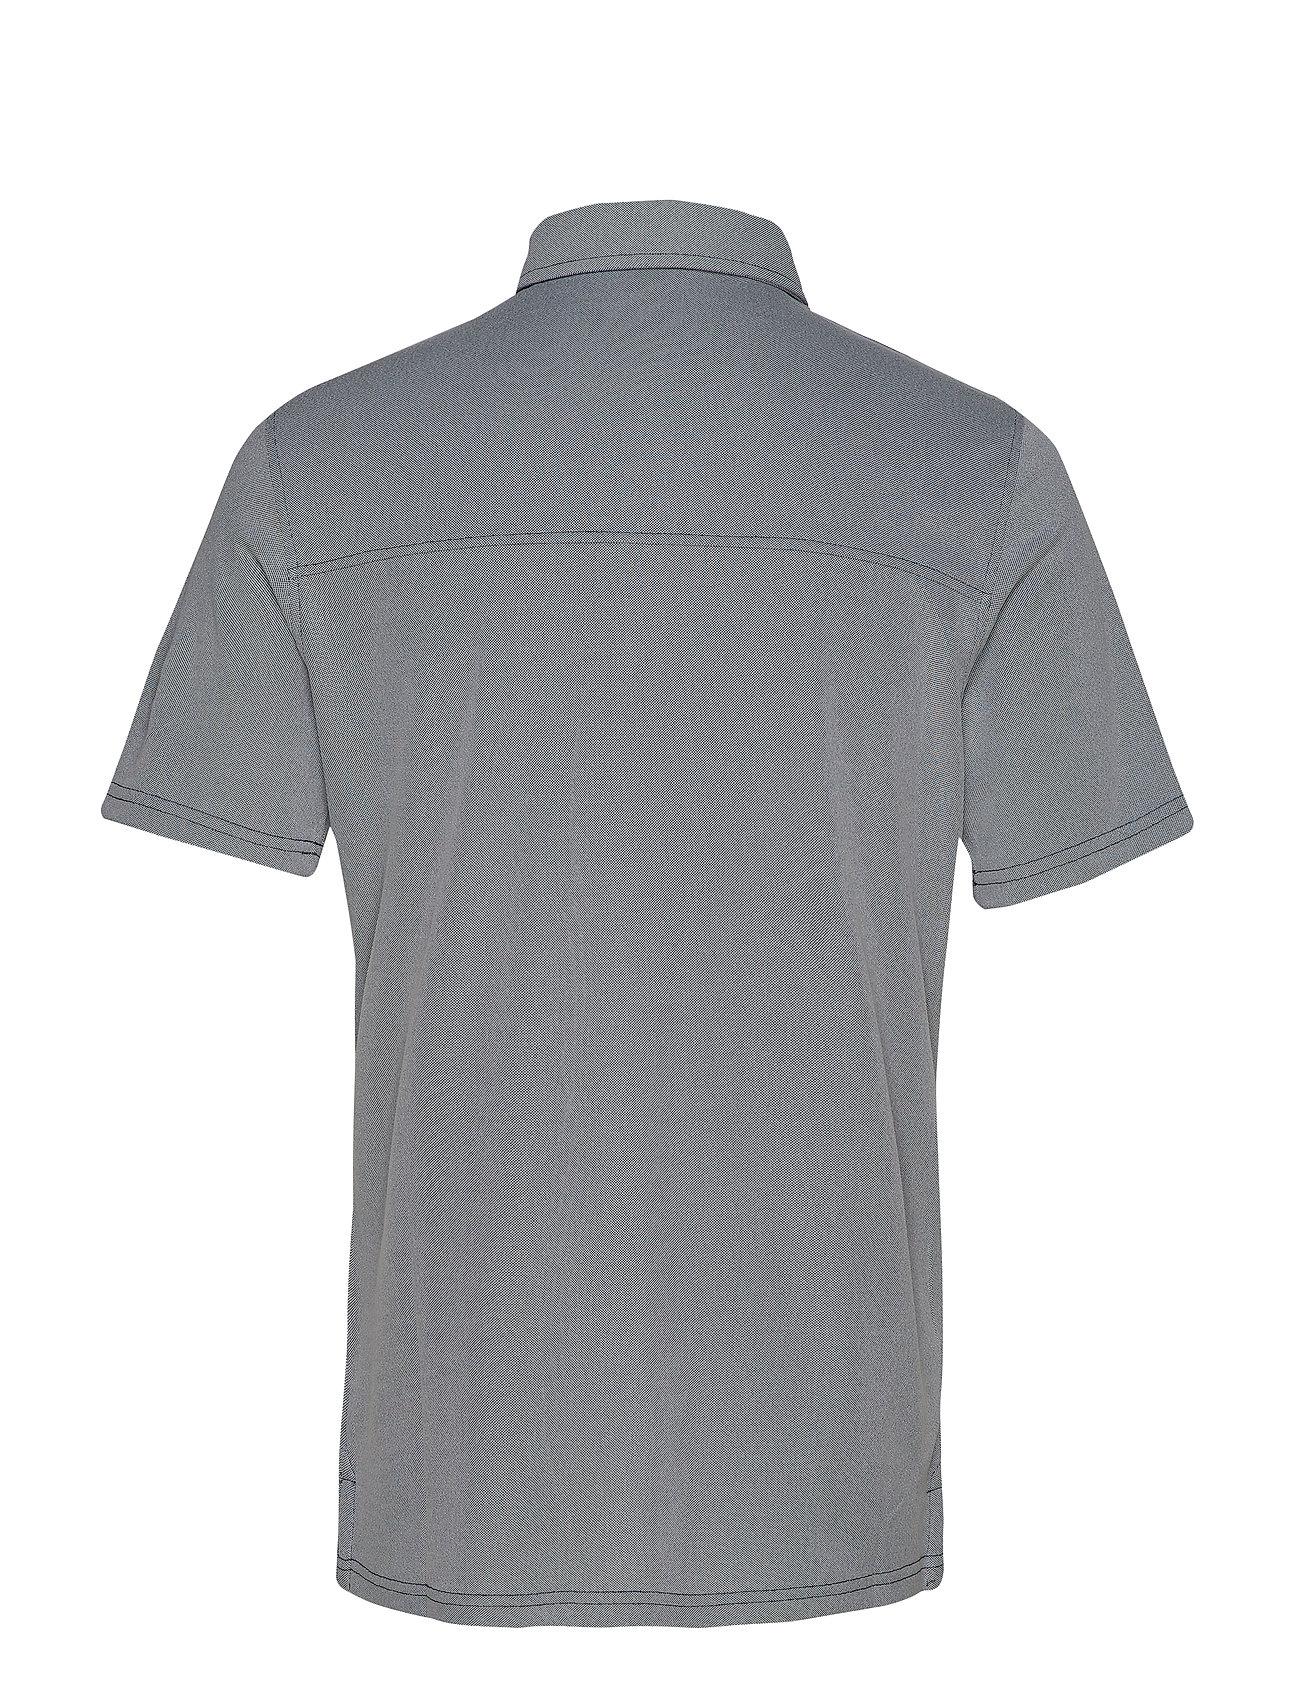 Blue M Shirtpeacoat Veikka MelangeHalti 8n0mNvw